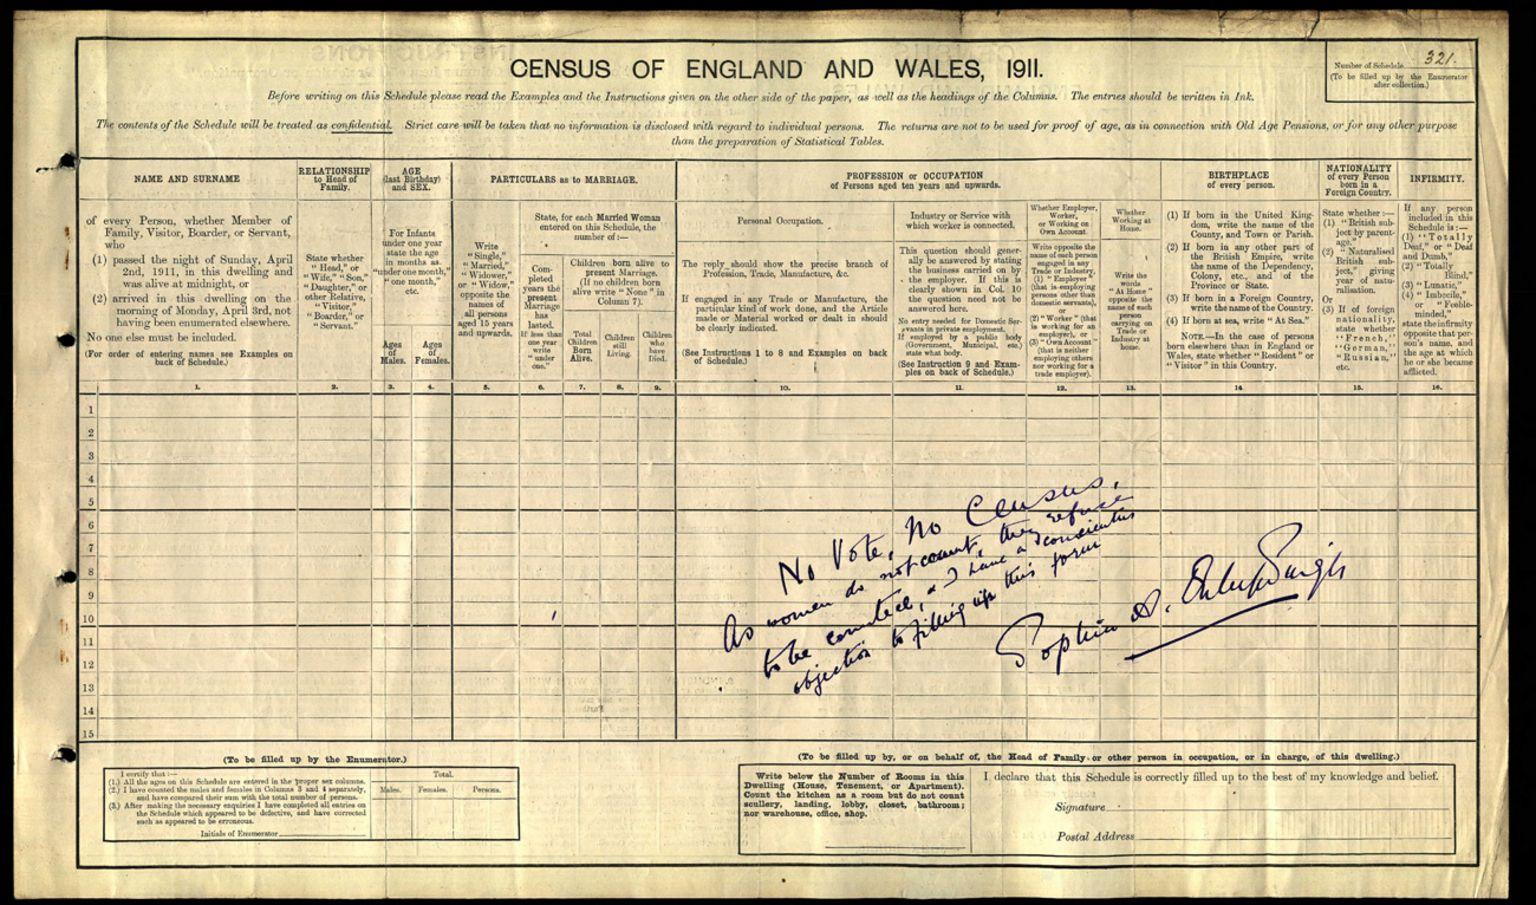 Princess Sophia Duleep Singh's census form